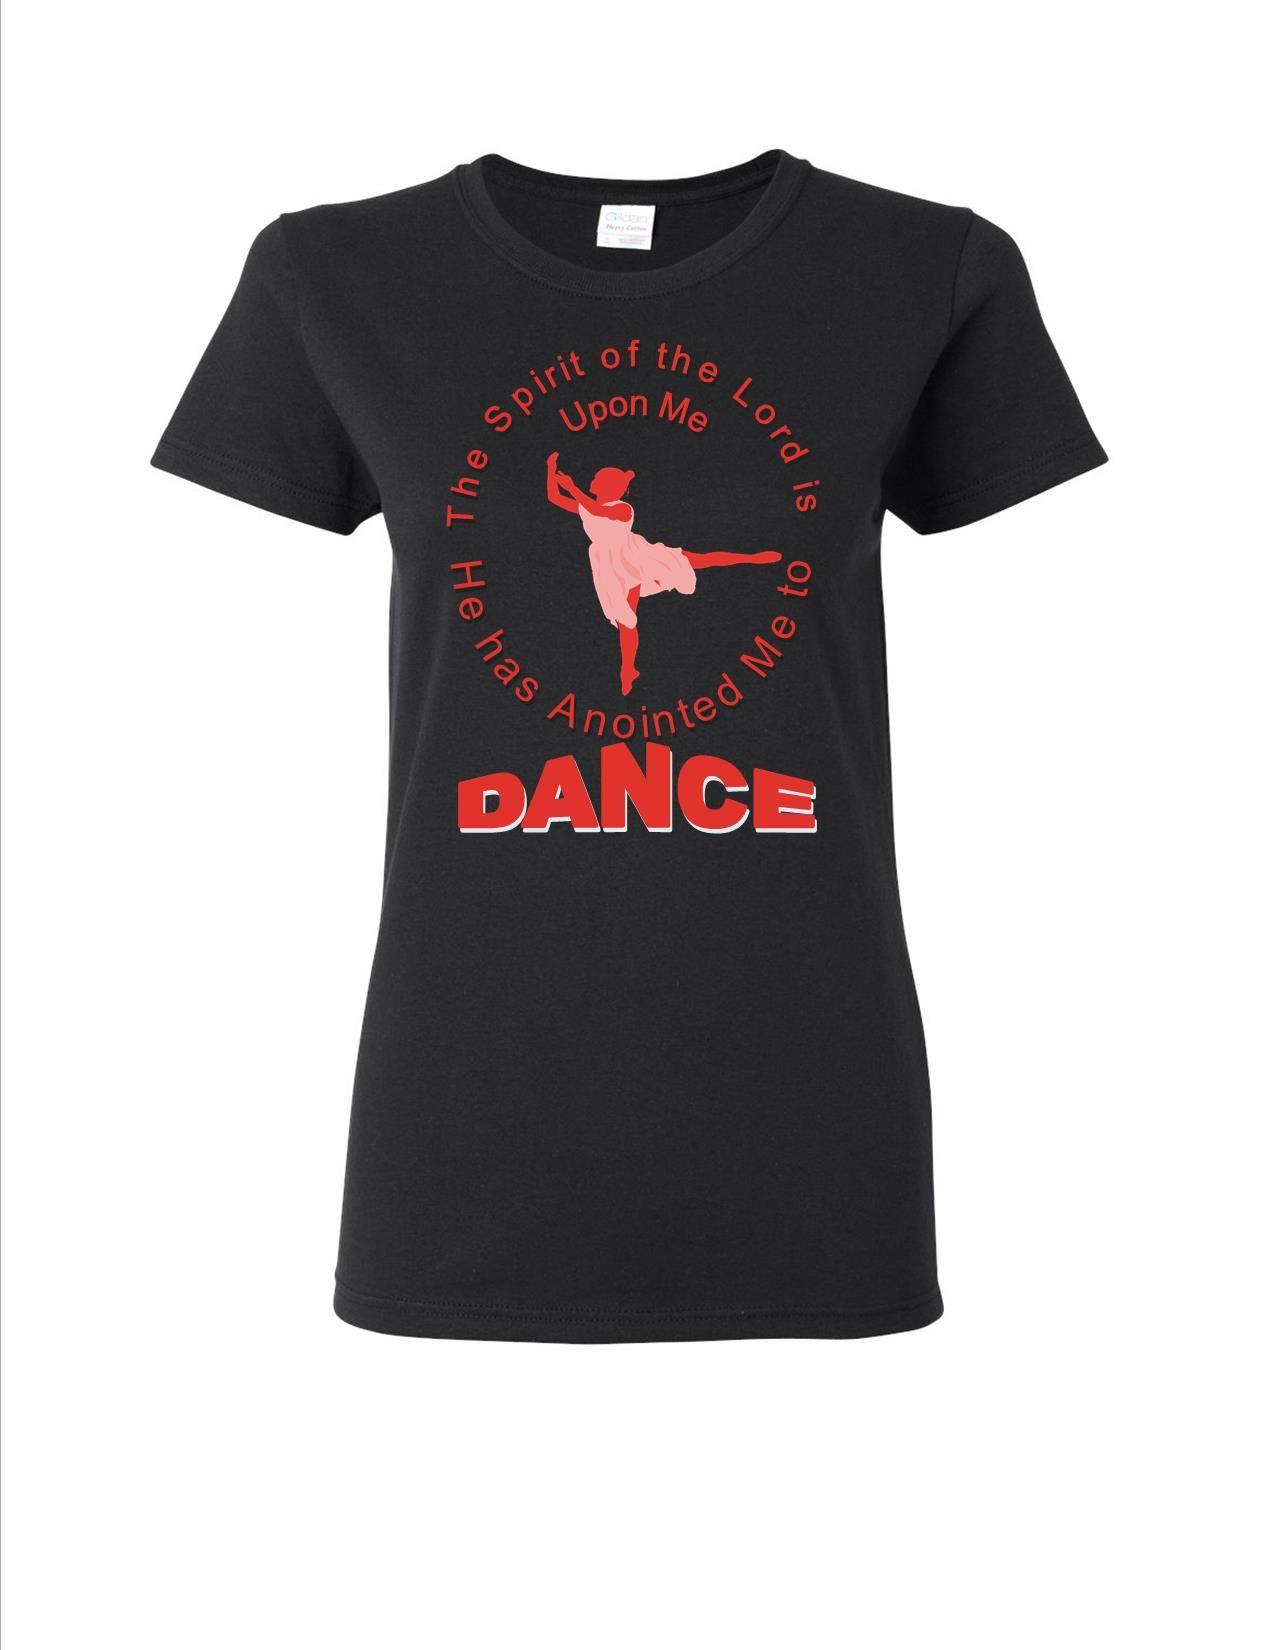 Praise Dance Shirt 20 Email Lajoycarr Joyful Connection Com Dance Shirts Praise Dance Worship Dance